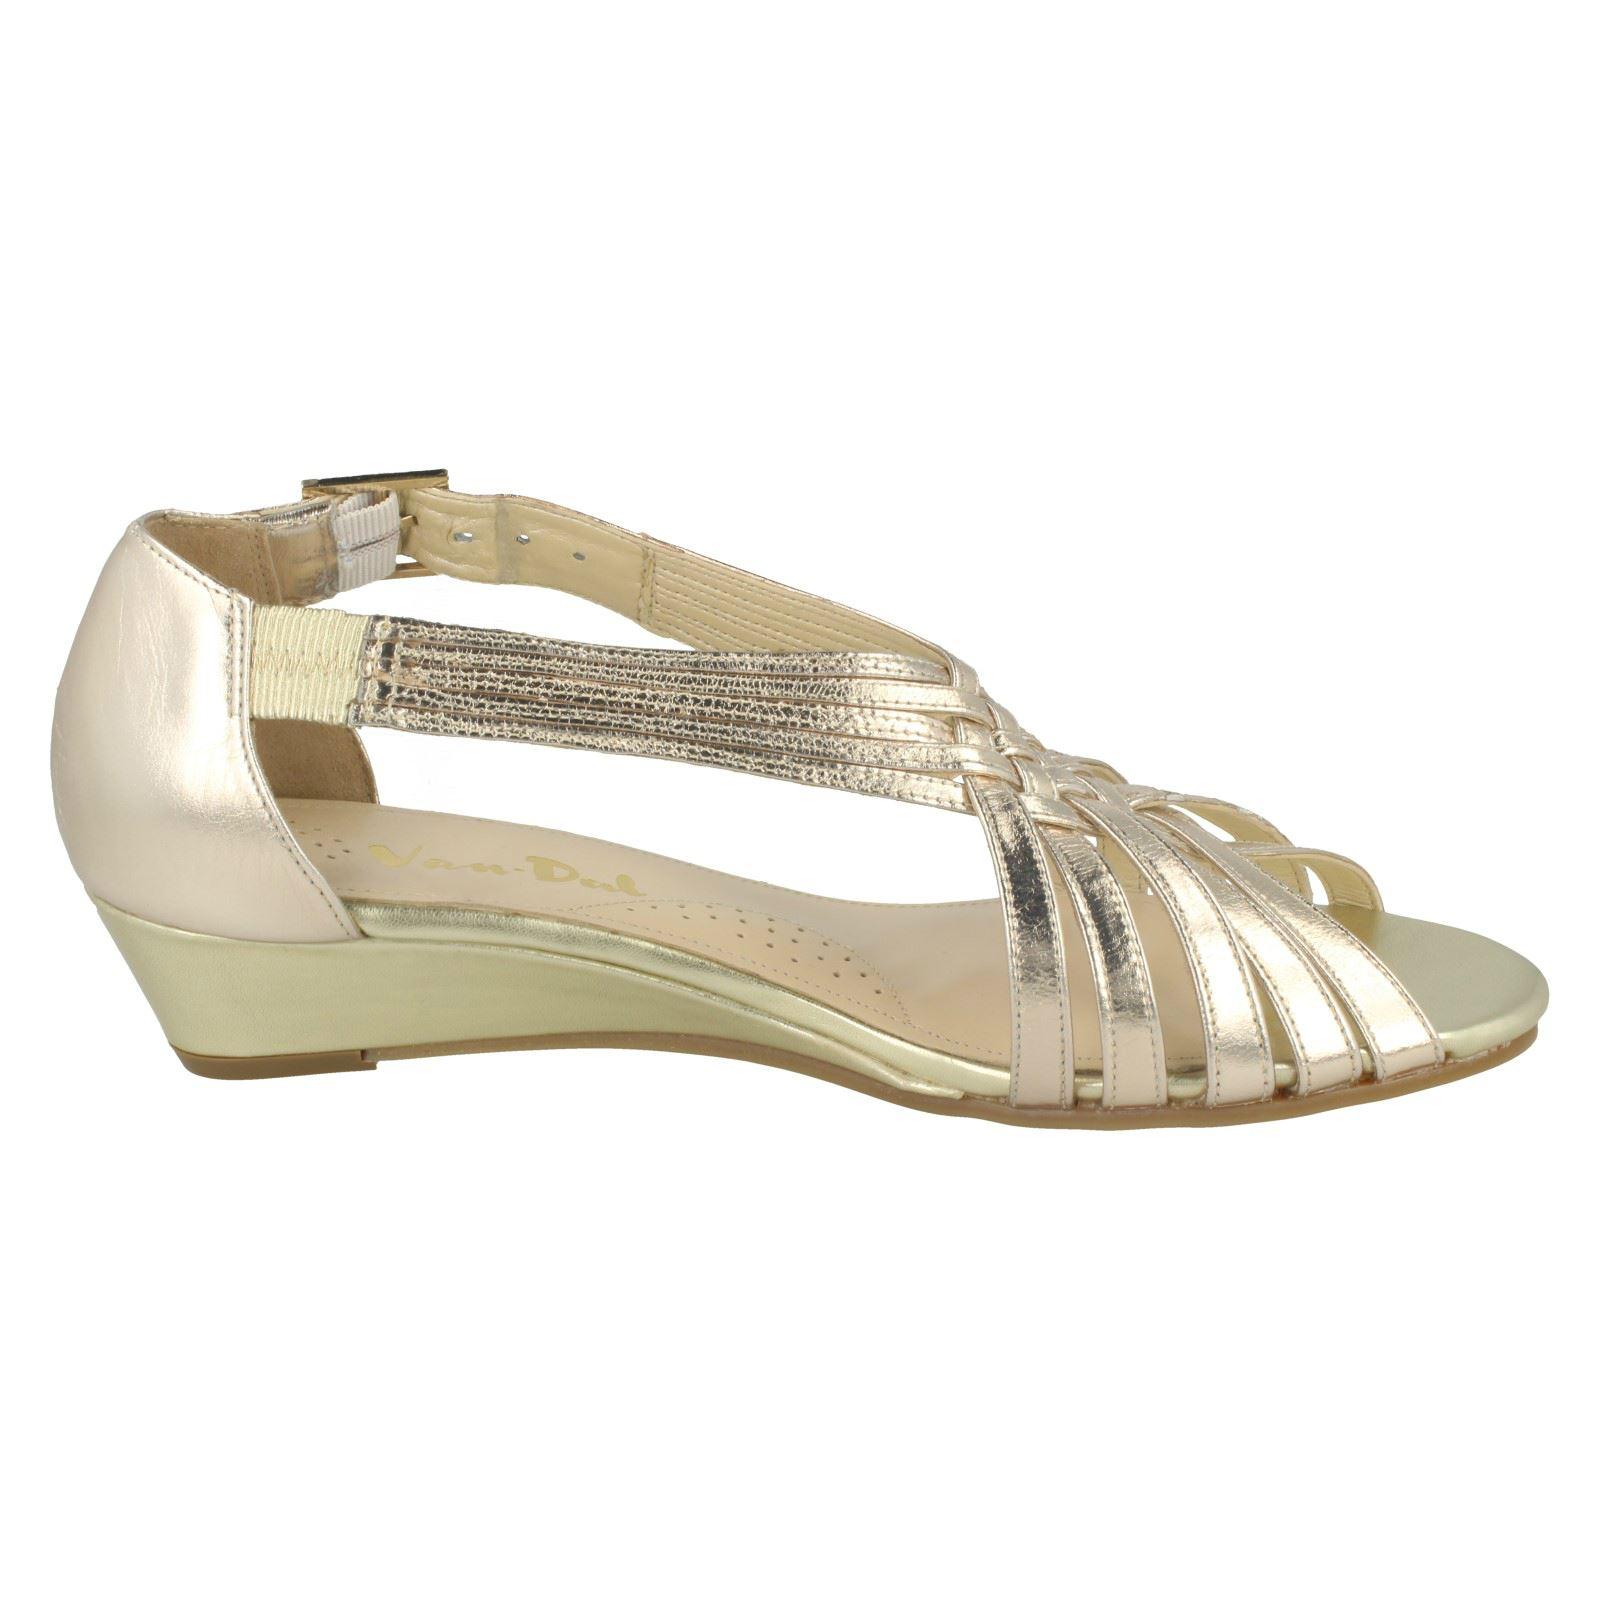 Ladies-Van-Dal-Wedge-Strappy-Sandals-Lucie thumbnail 24